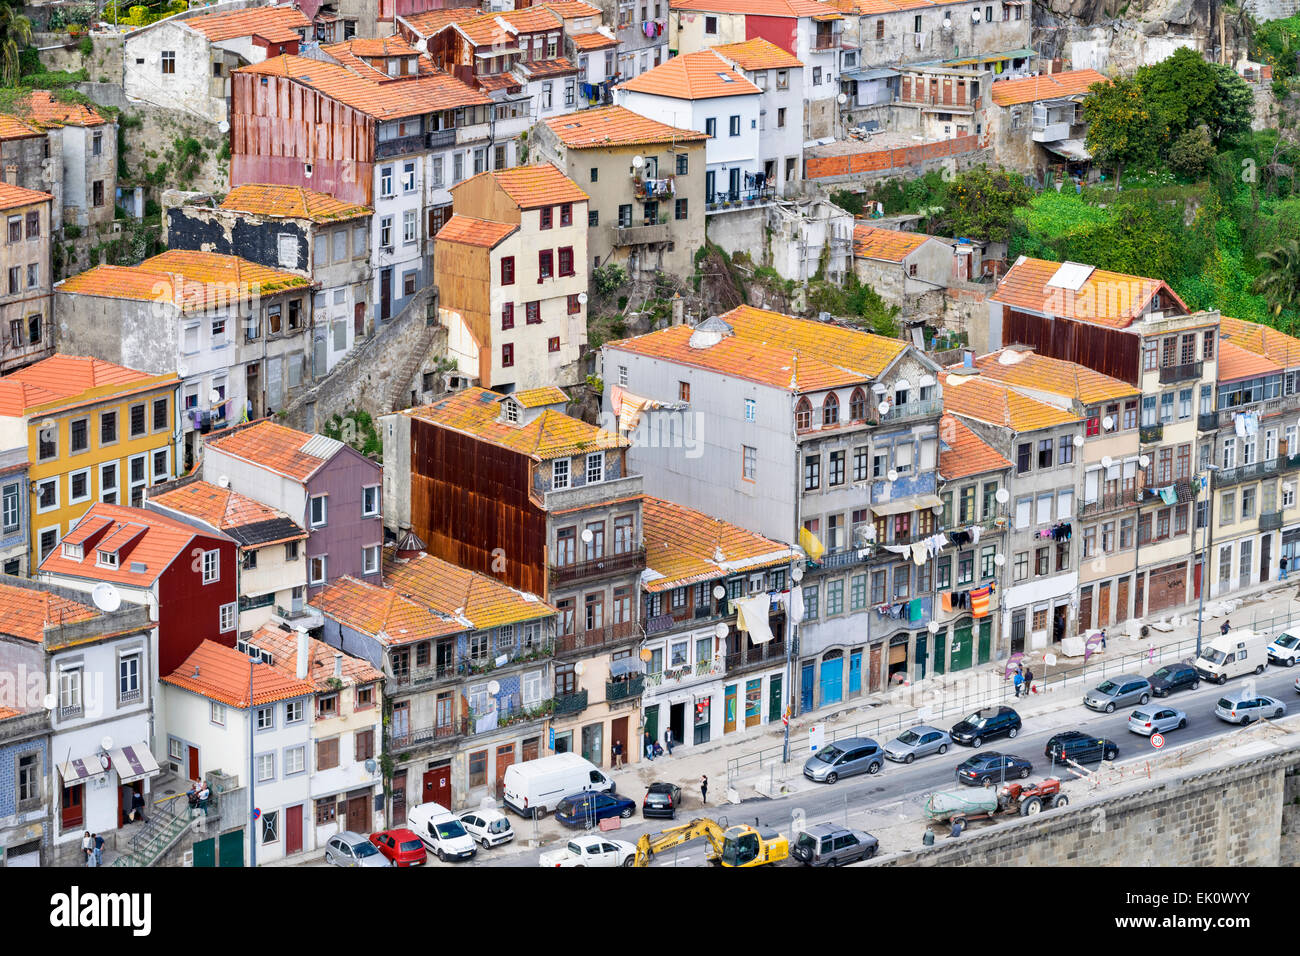 PORTO PORTUGAL  THE RIVER DOURO AND HOUSES ON THE PASSEIO DAS FONTAINHAS AND THE AVENUE GUSTAVO EIFFEL - Stock Image